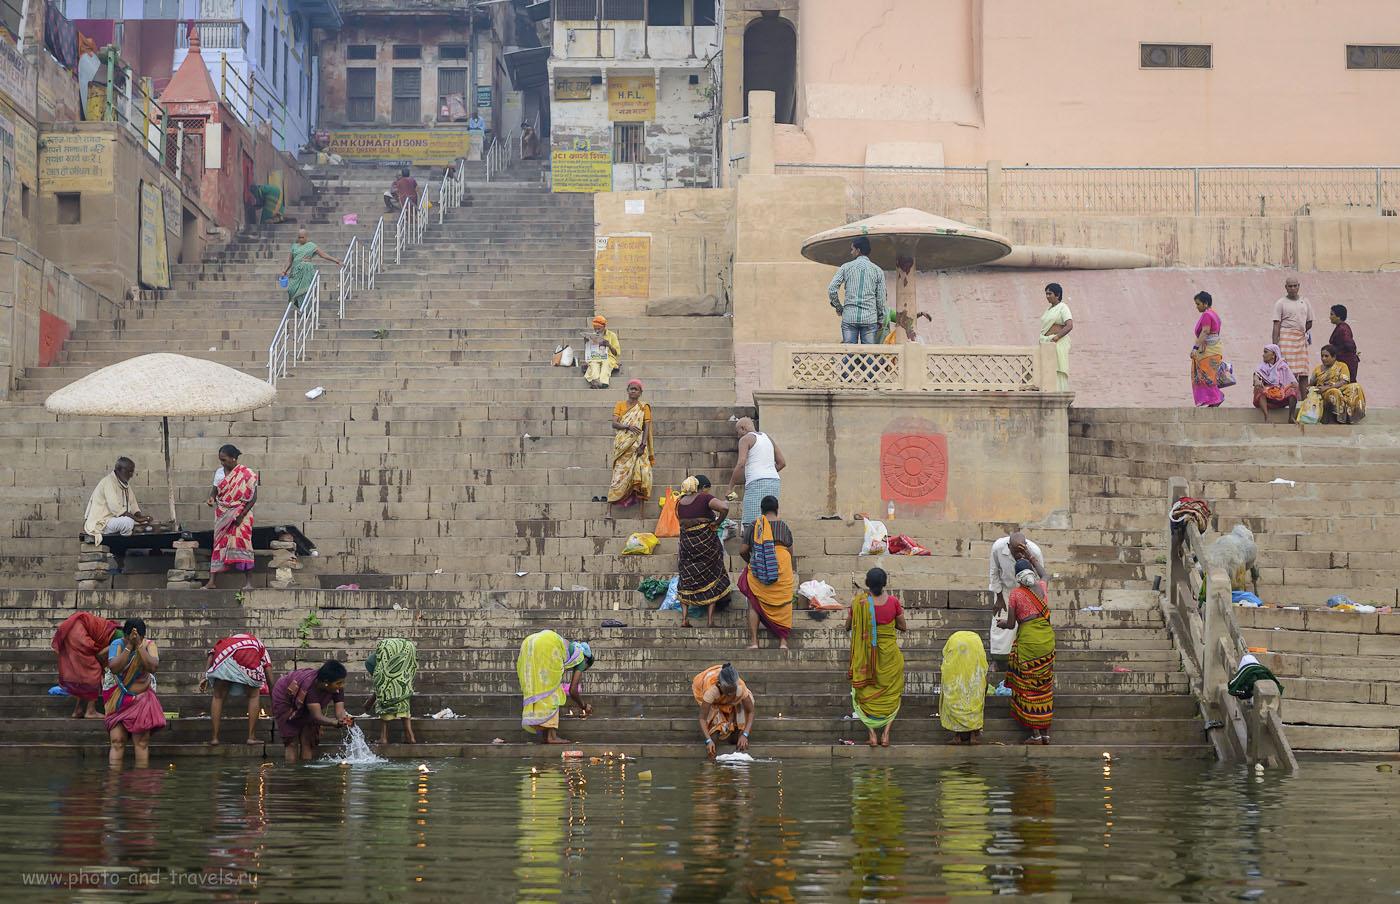 Фотография 16. Паломники совершают утреннюю пуджу на реке Ганга в Варанаси. 1/320, 3.2, 800, 56.